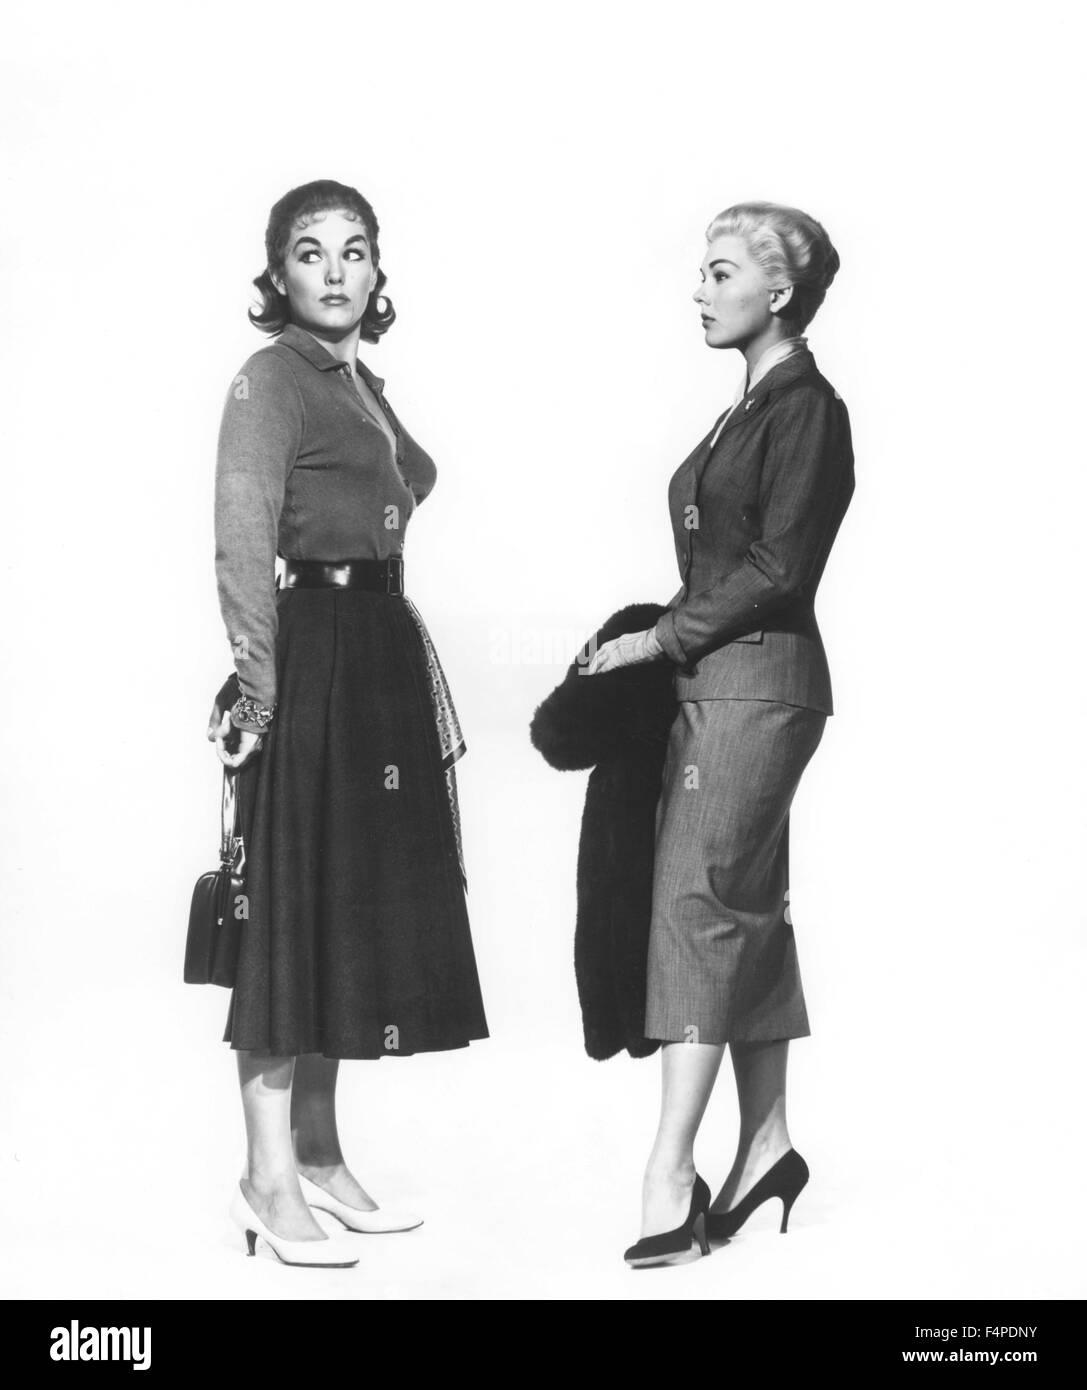 Kim Novak / Vertigo 1958 directed by Alfred Hitchcock - Stock Image